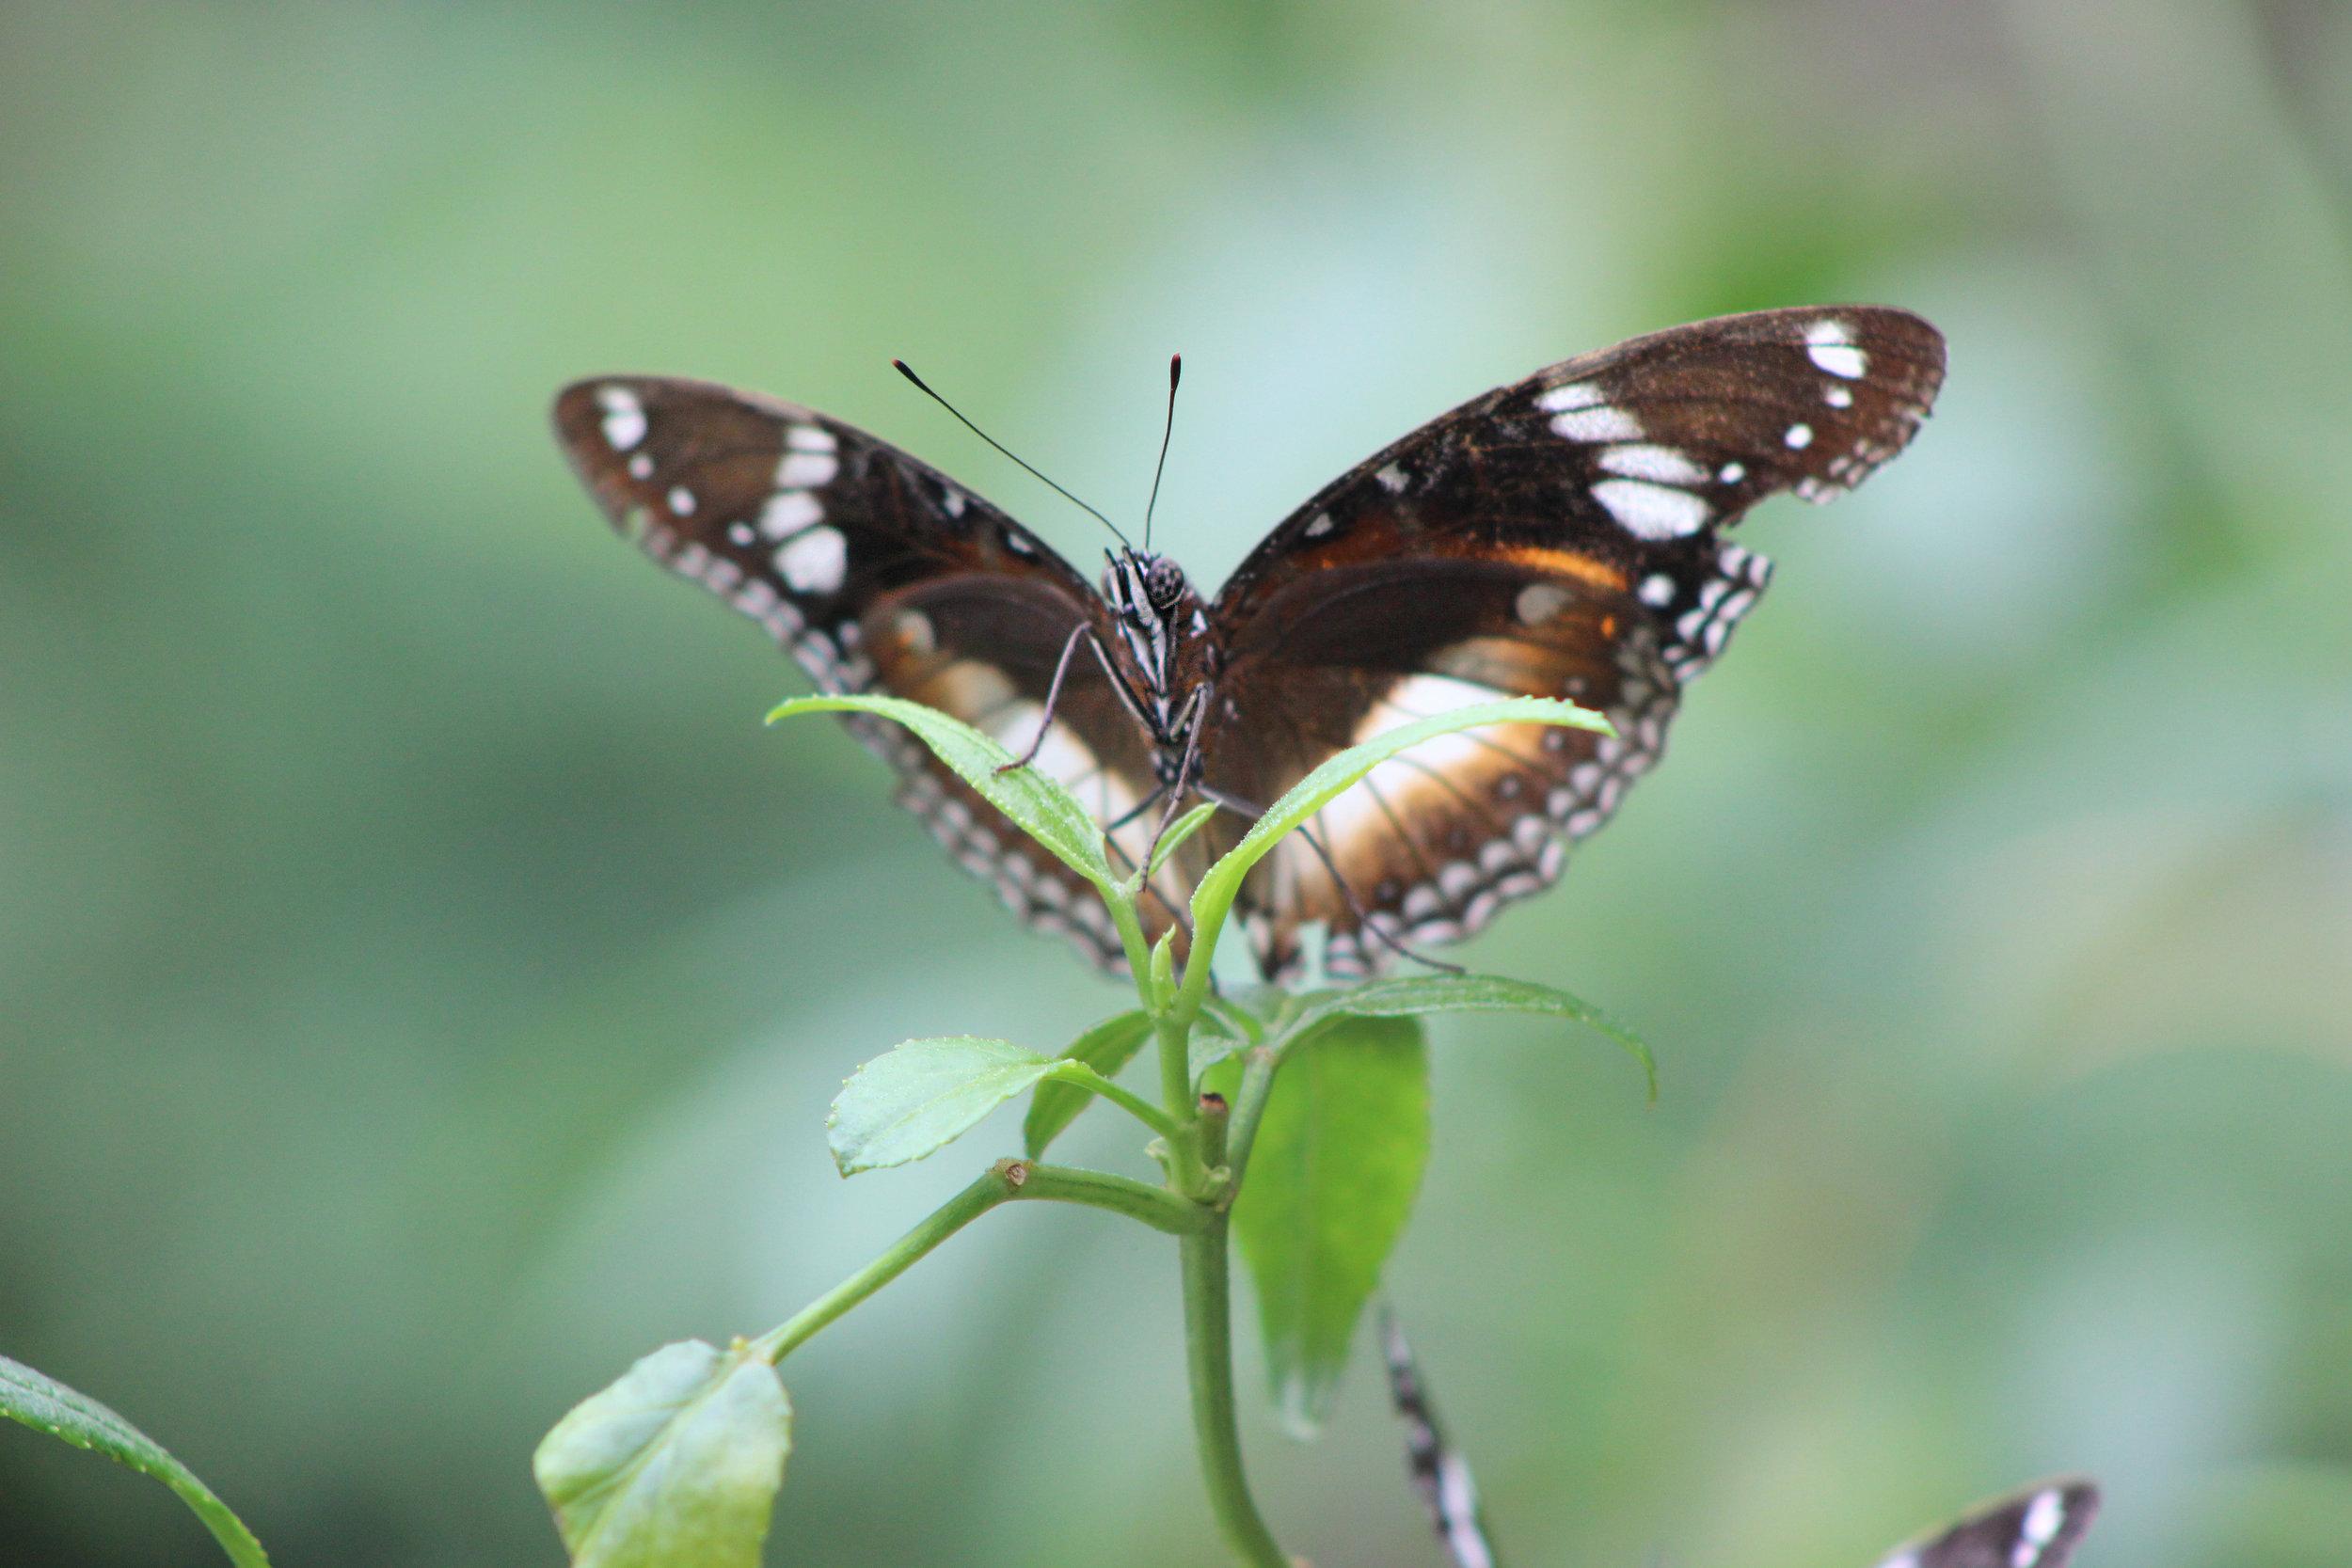 Butterfly_MelbZoo18_JessicaJaneRule.jpg